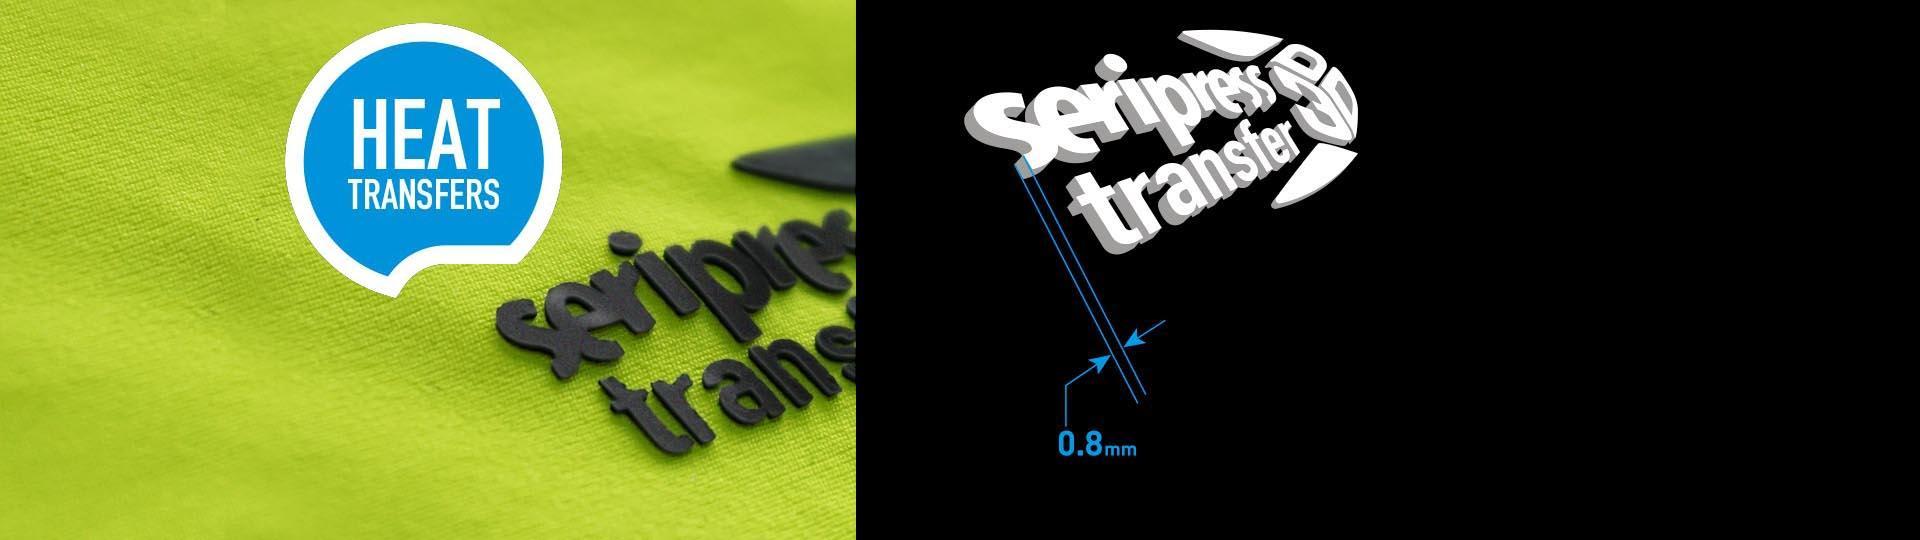 3D TRANSFER - image 7